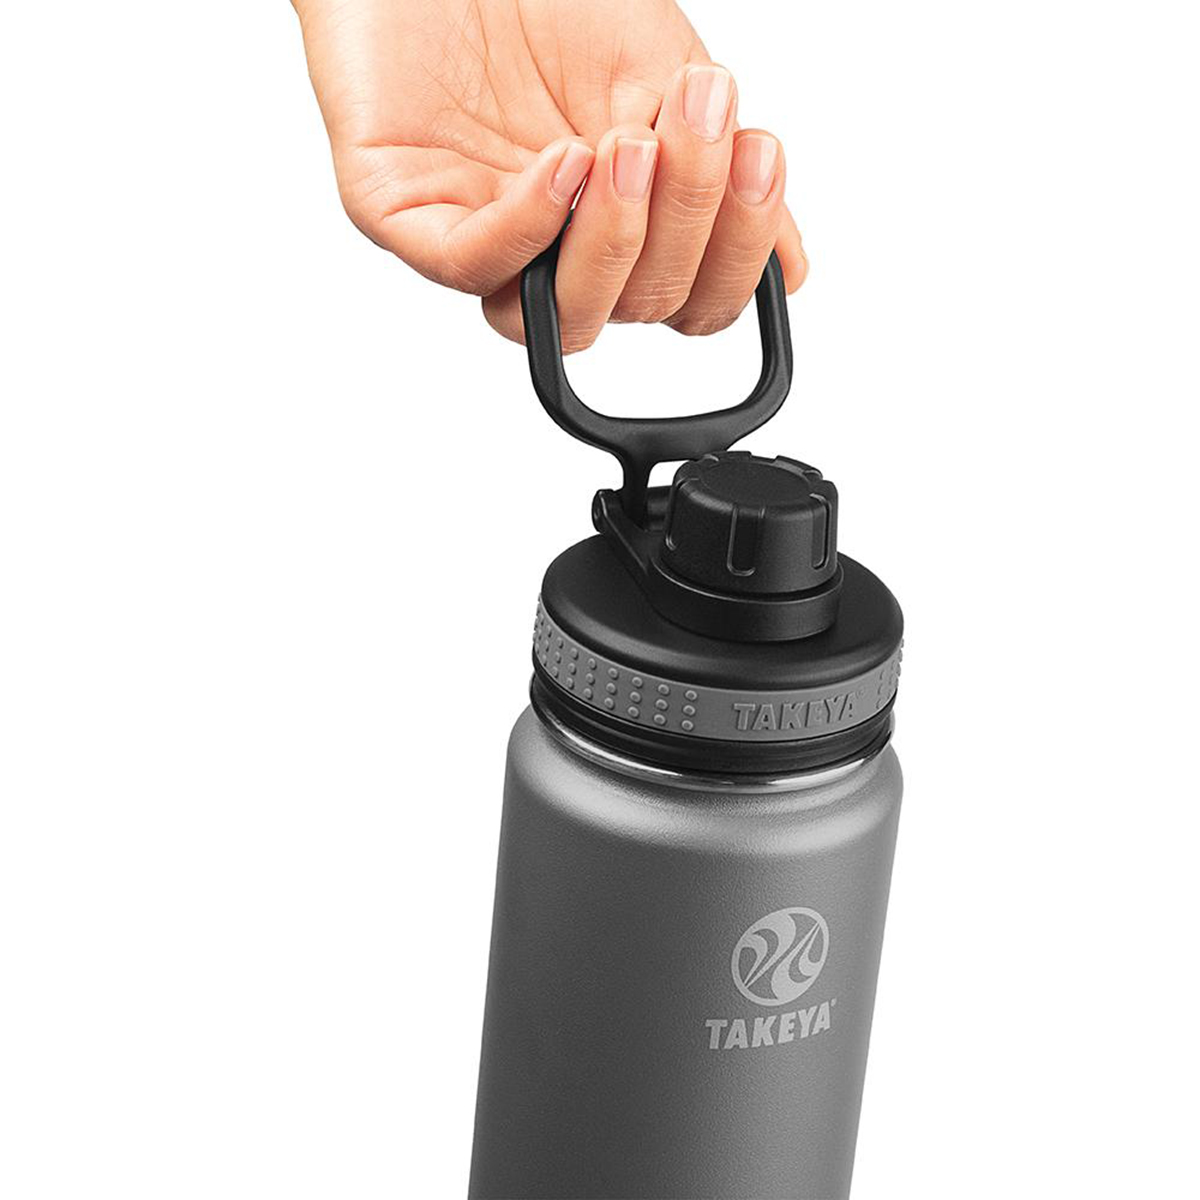 Takeya-Originals-32-oz-Insulated-Stainless-Steel-Water-Bottle thumbnail 9